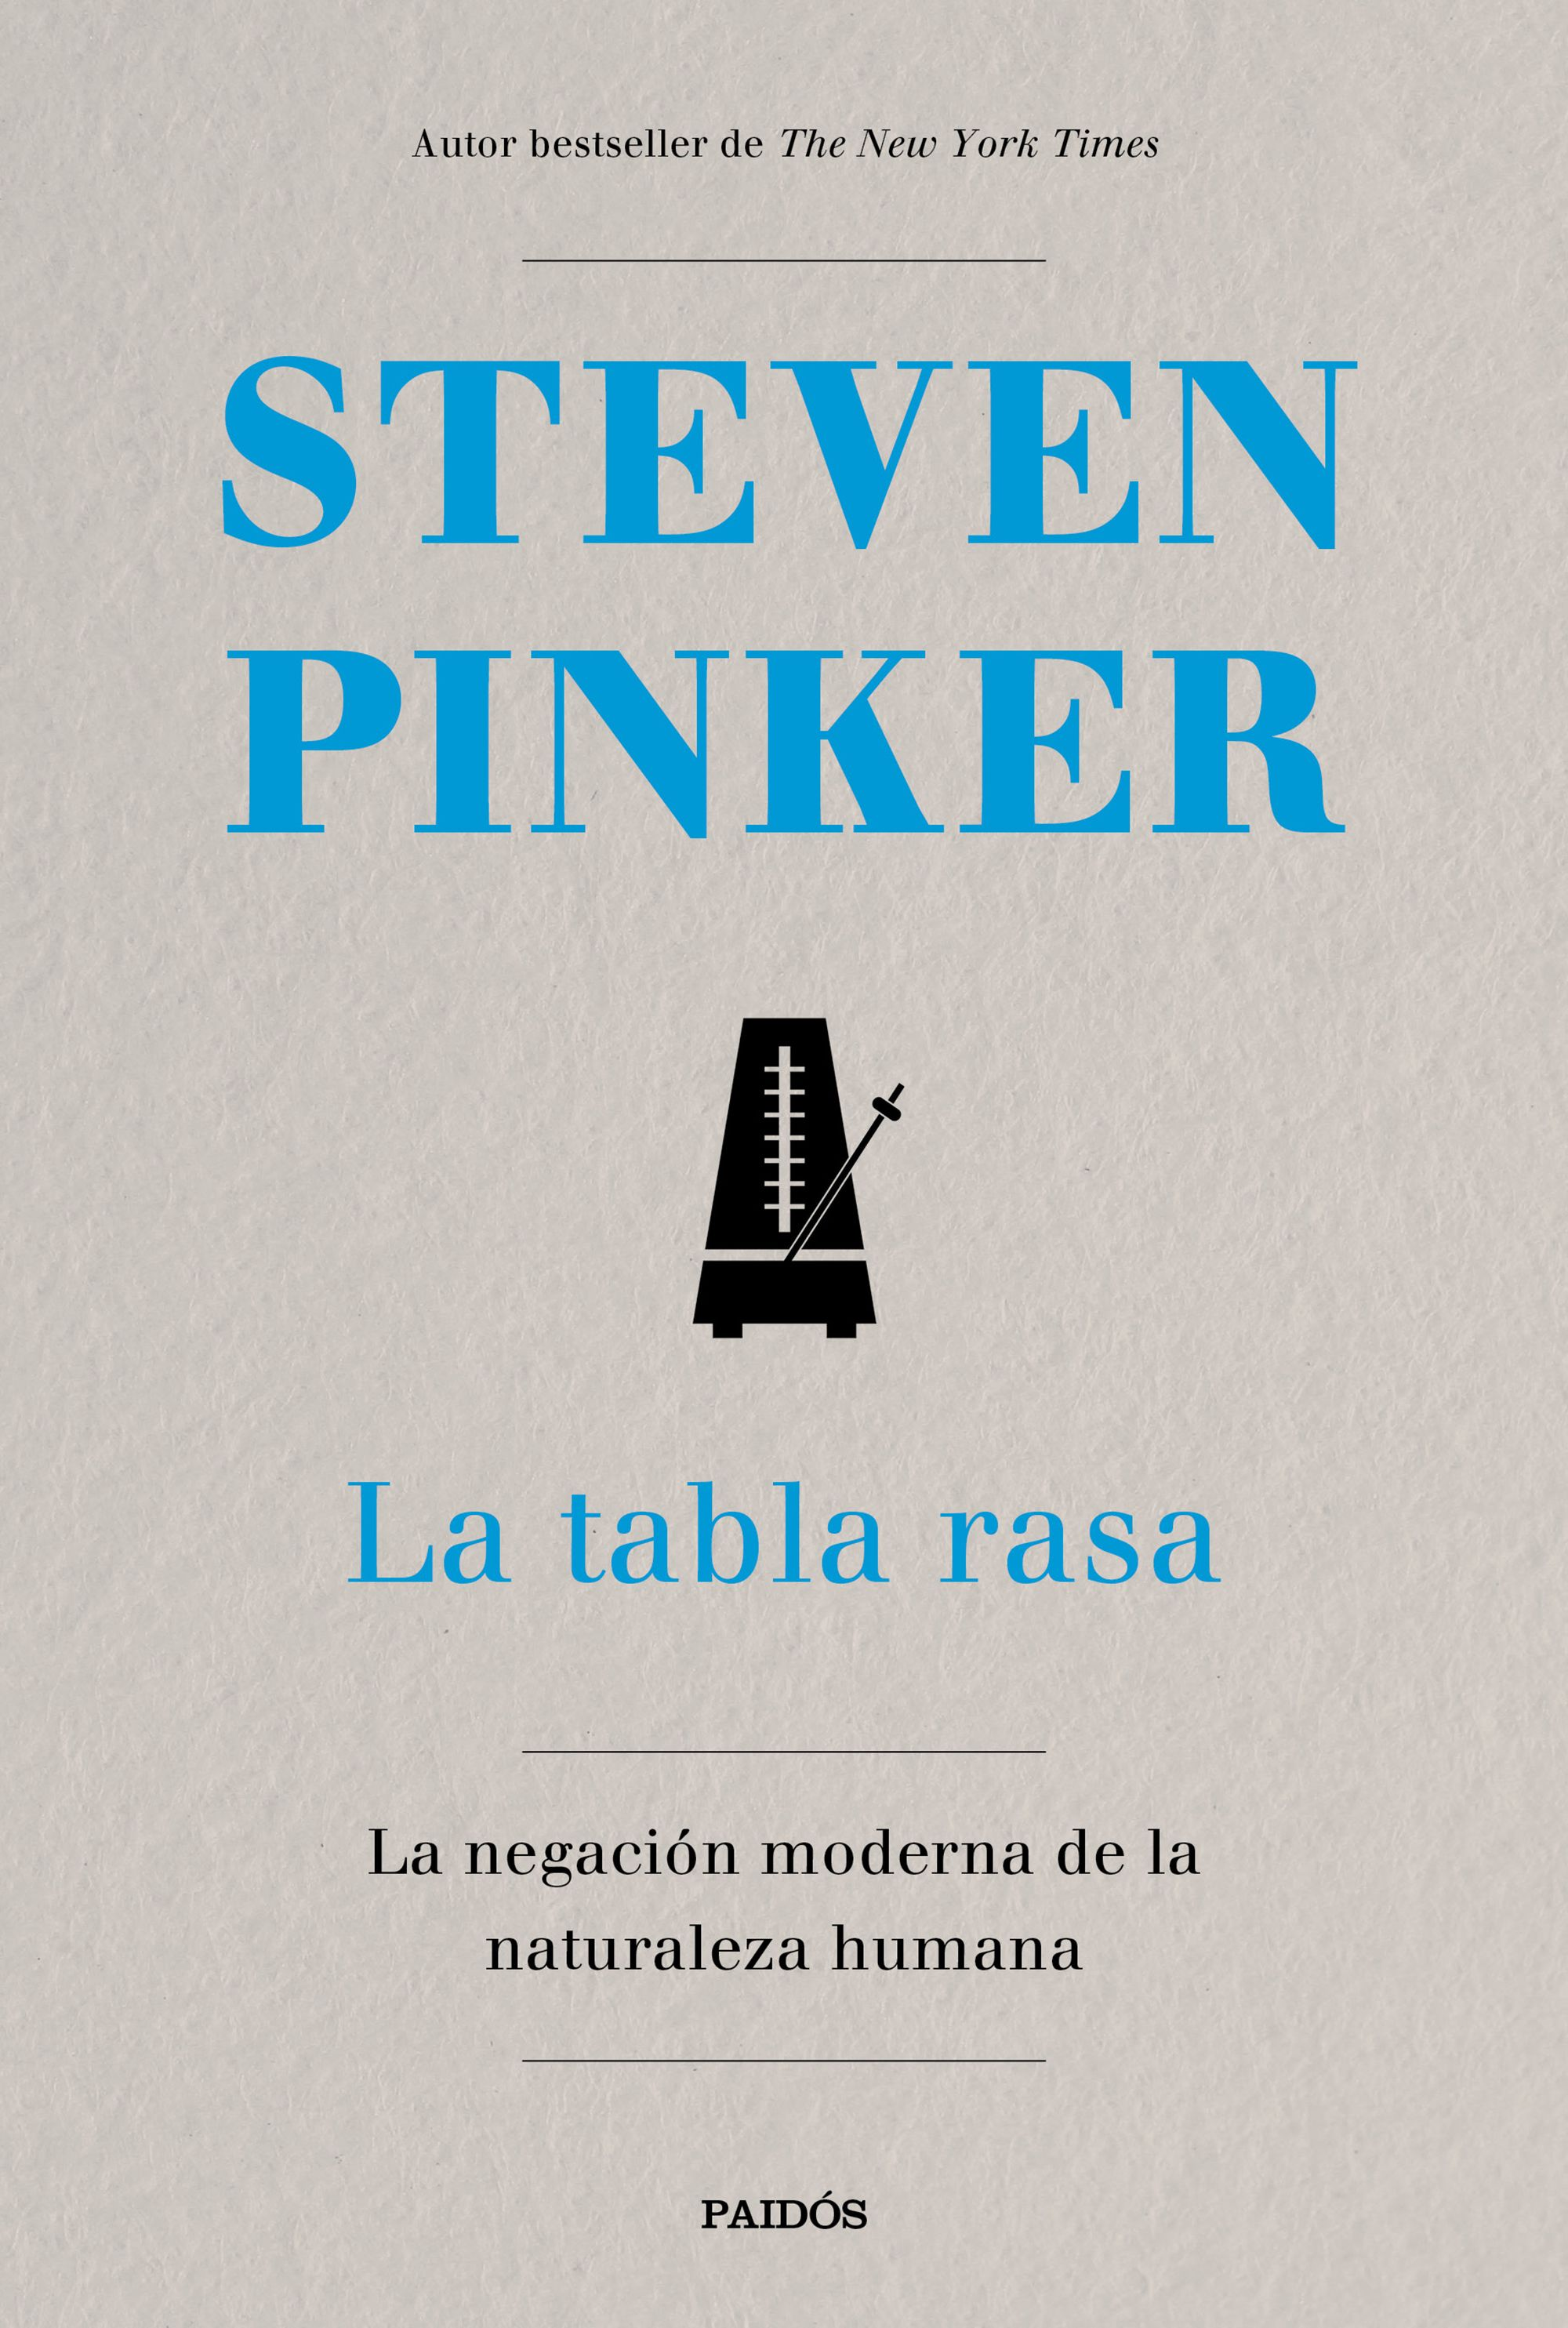 La Tabla Rasa - Steven Pinker - Paidos